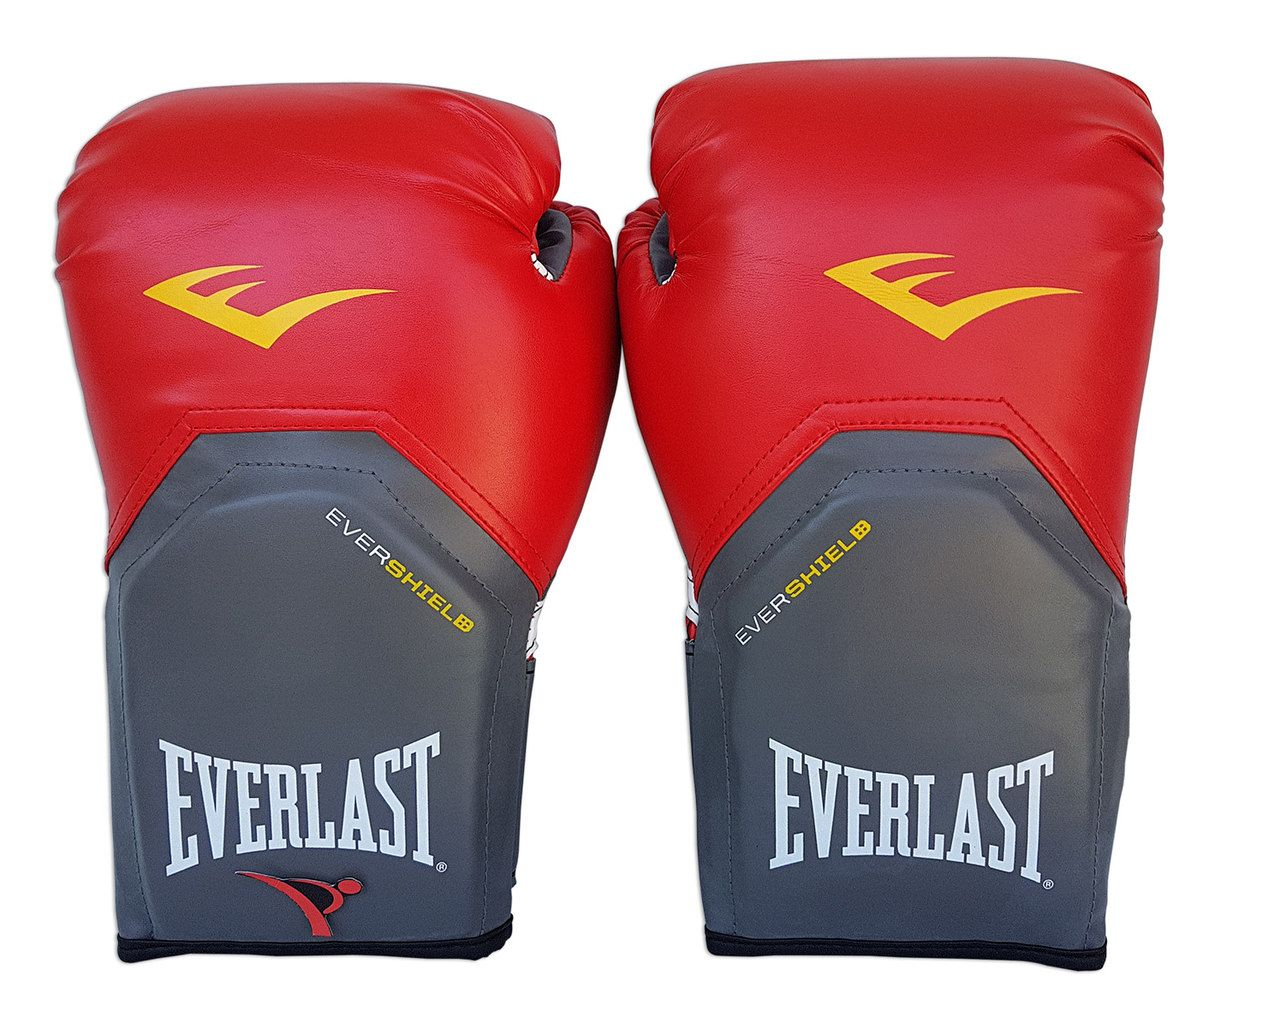 60aa8bc4a0 Luva de Boxe   Muay Thai 14oz - Vermelho - Pro Style - Everlast - PRALUTA  ...